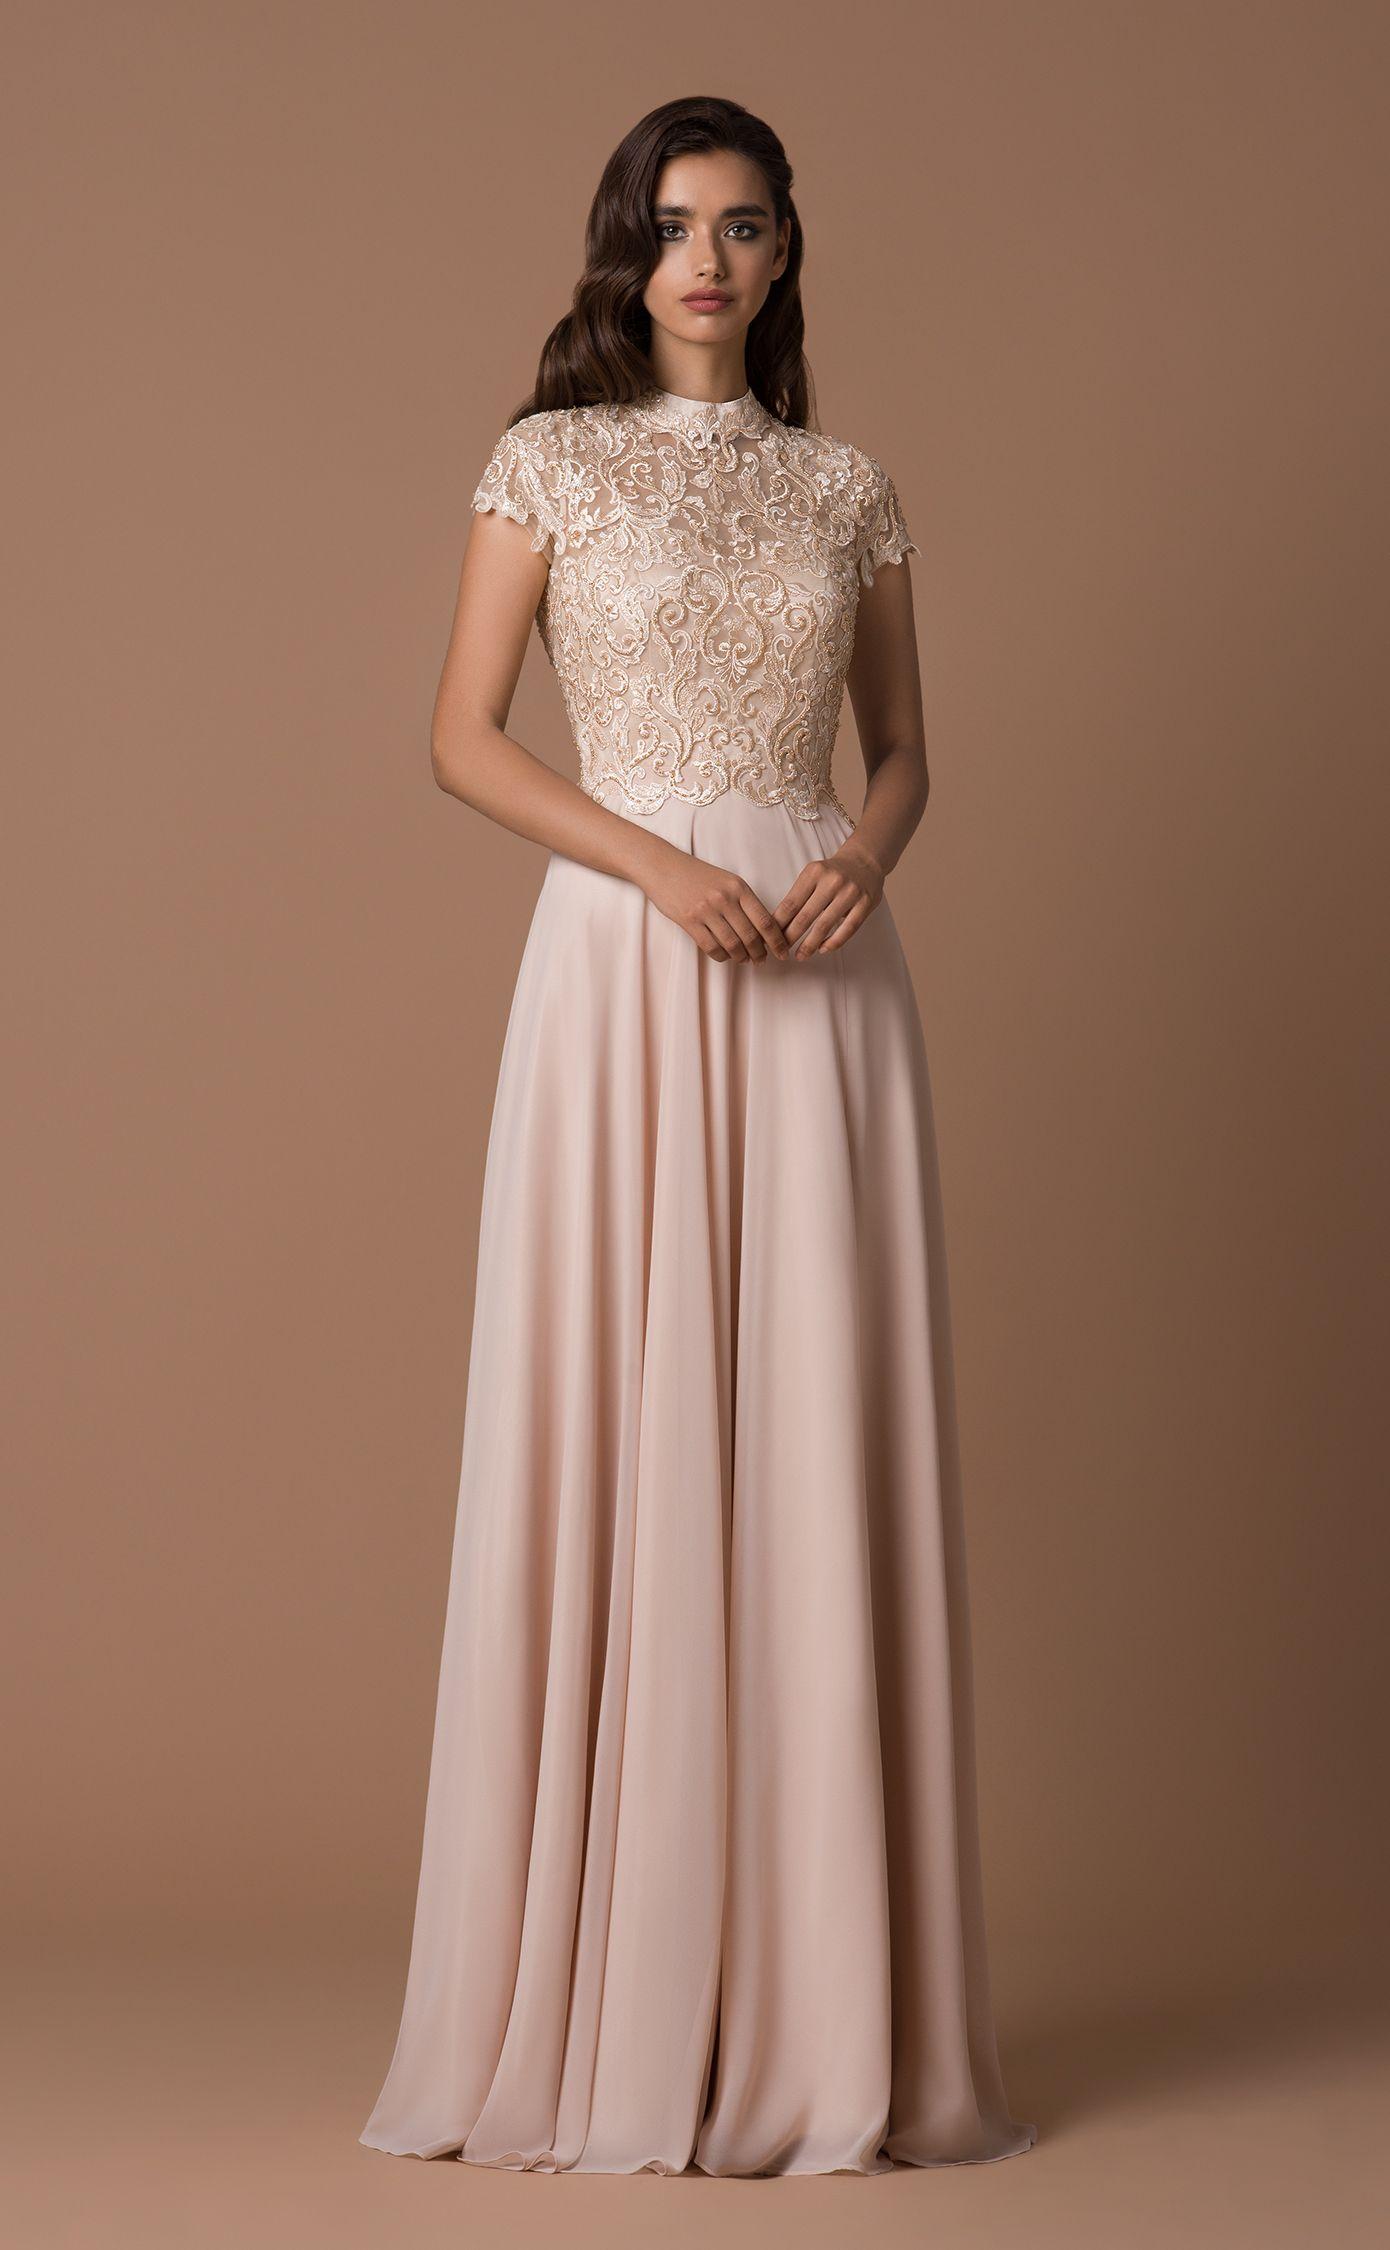 Abendkleid Tessa  Abendkleid, Kleider, Modestil